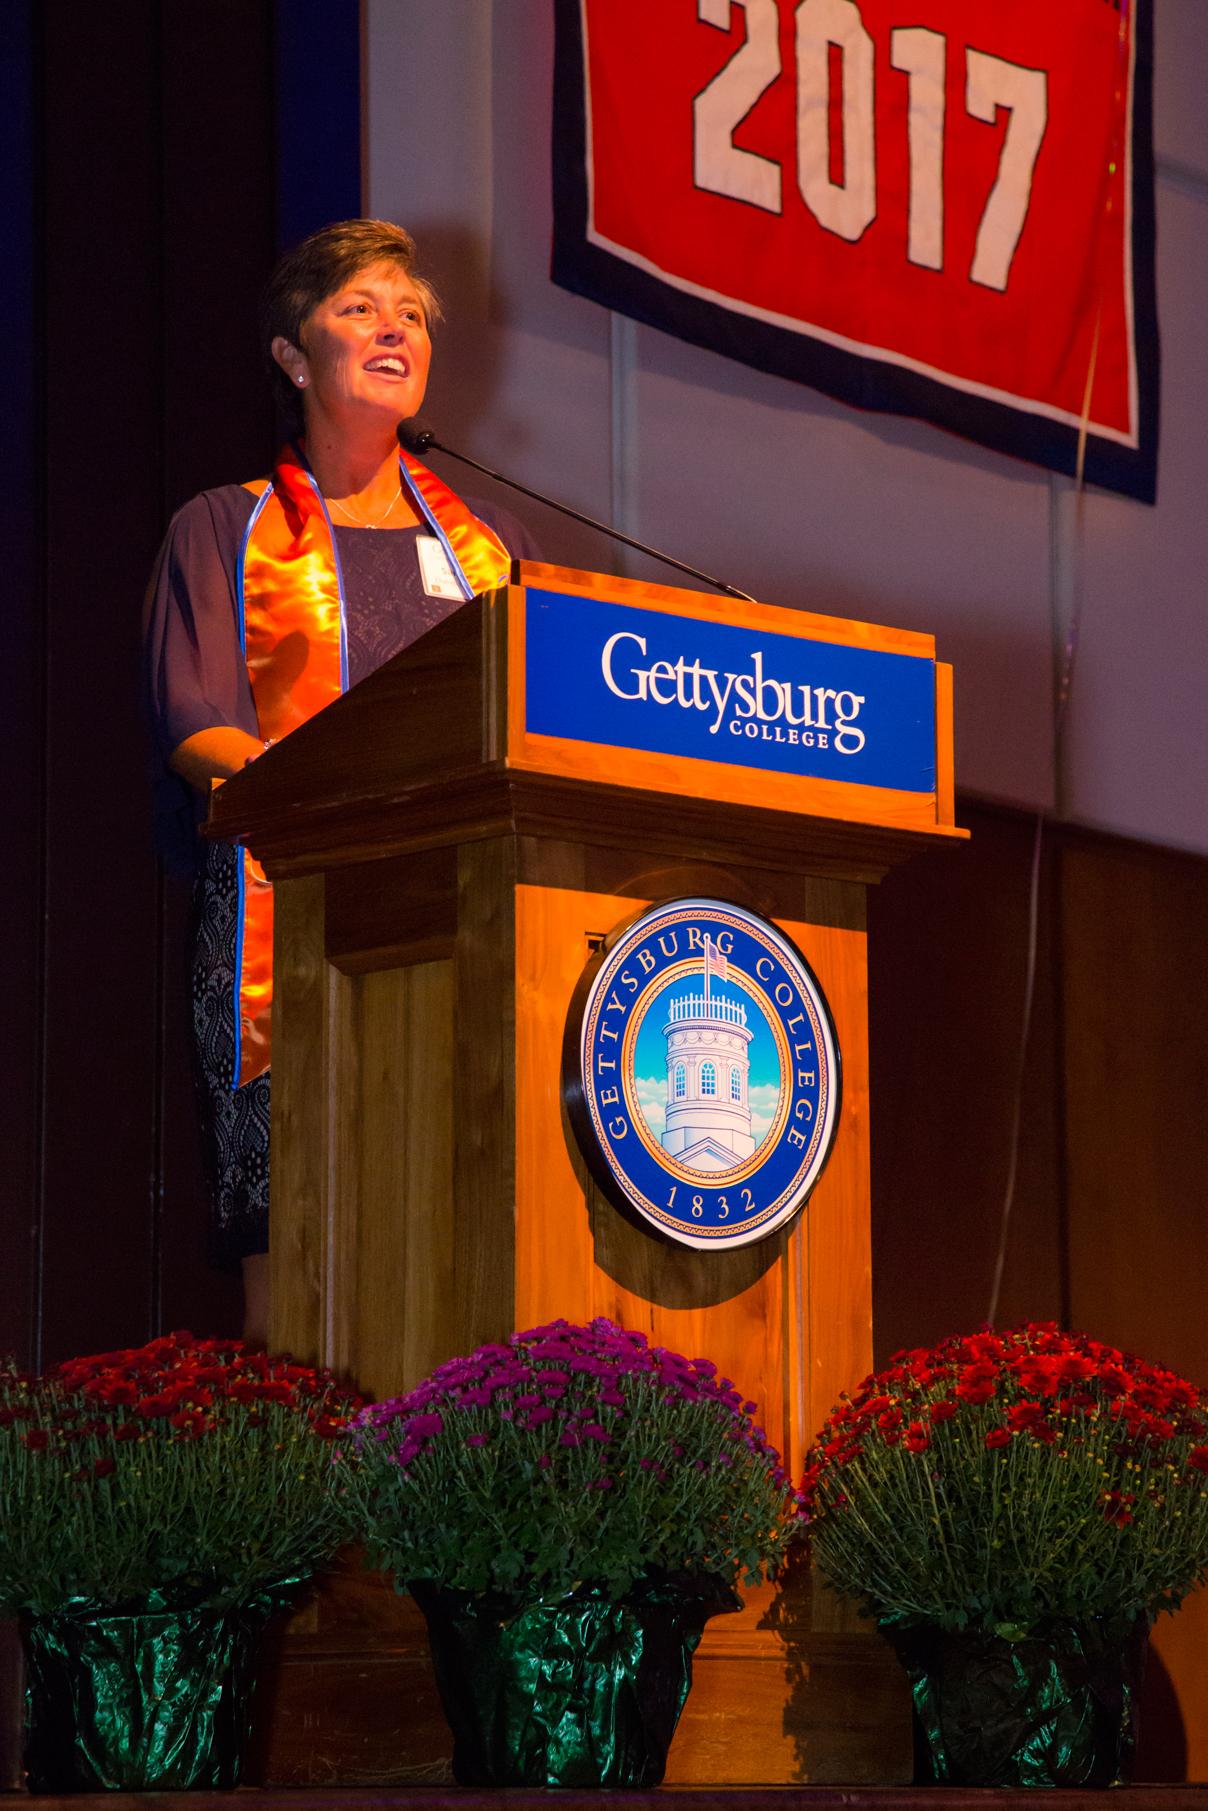 © ProArts Media - Gettysburg College - HC 12.jpg